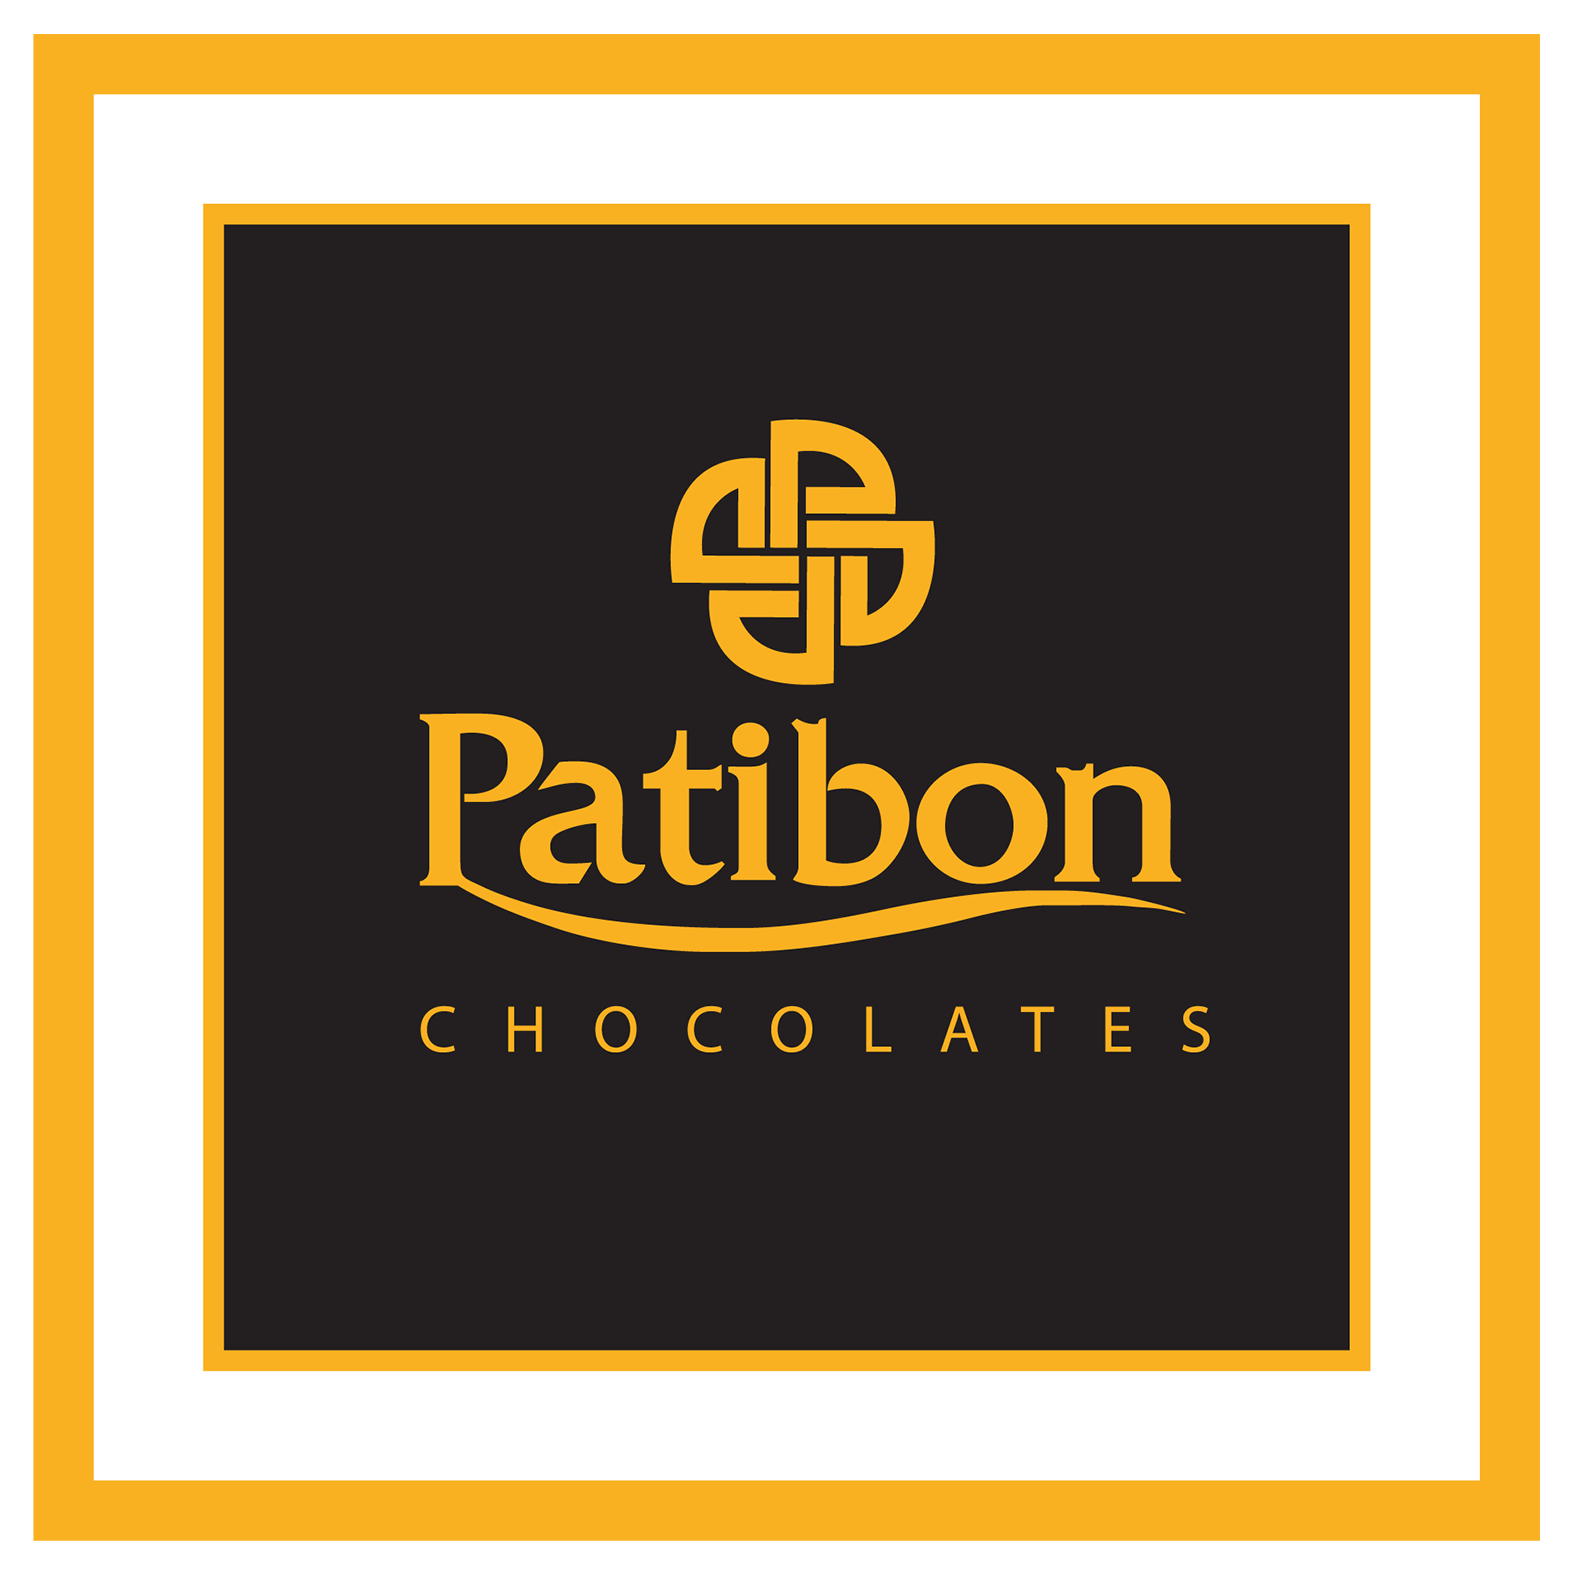 Patibon